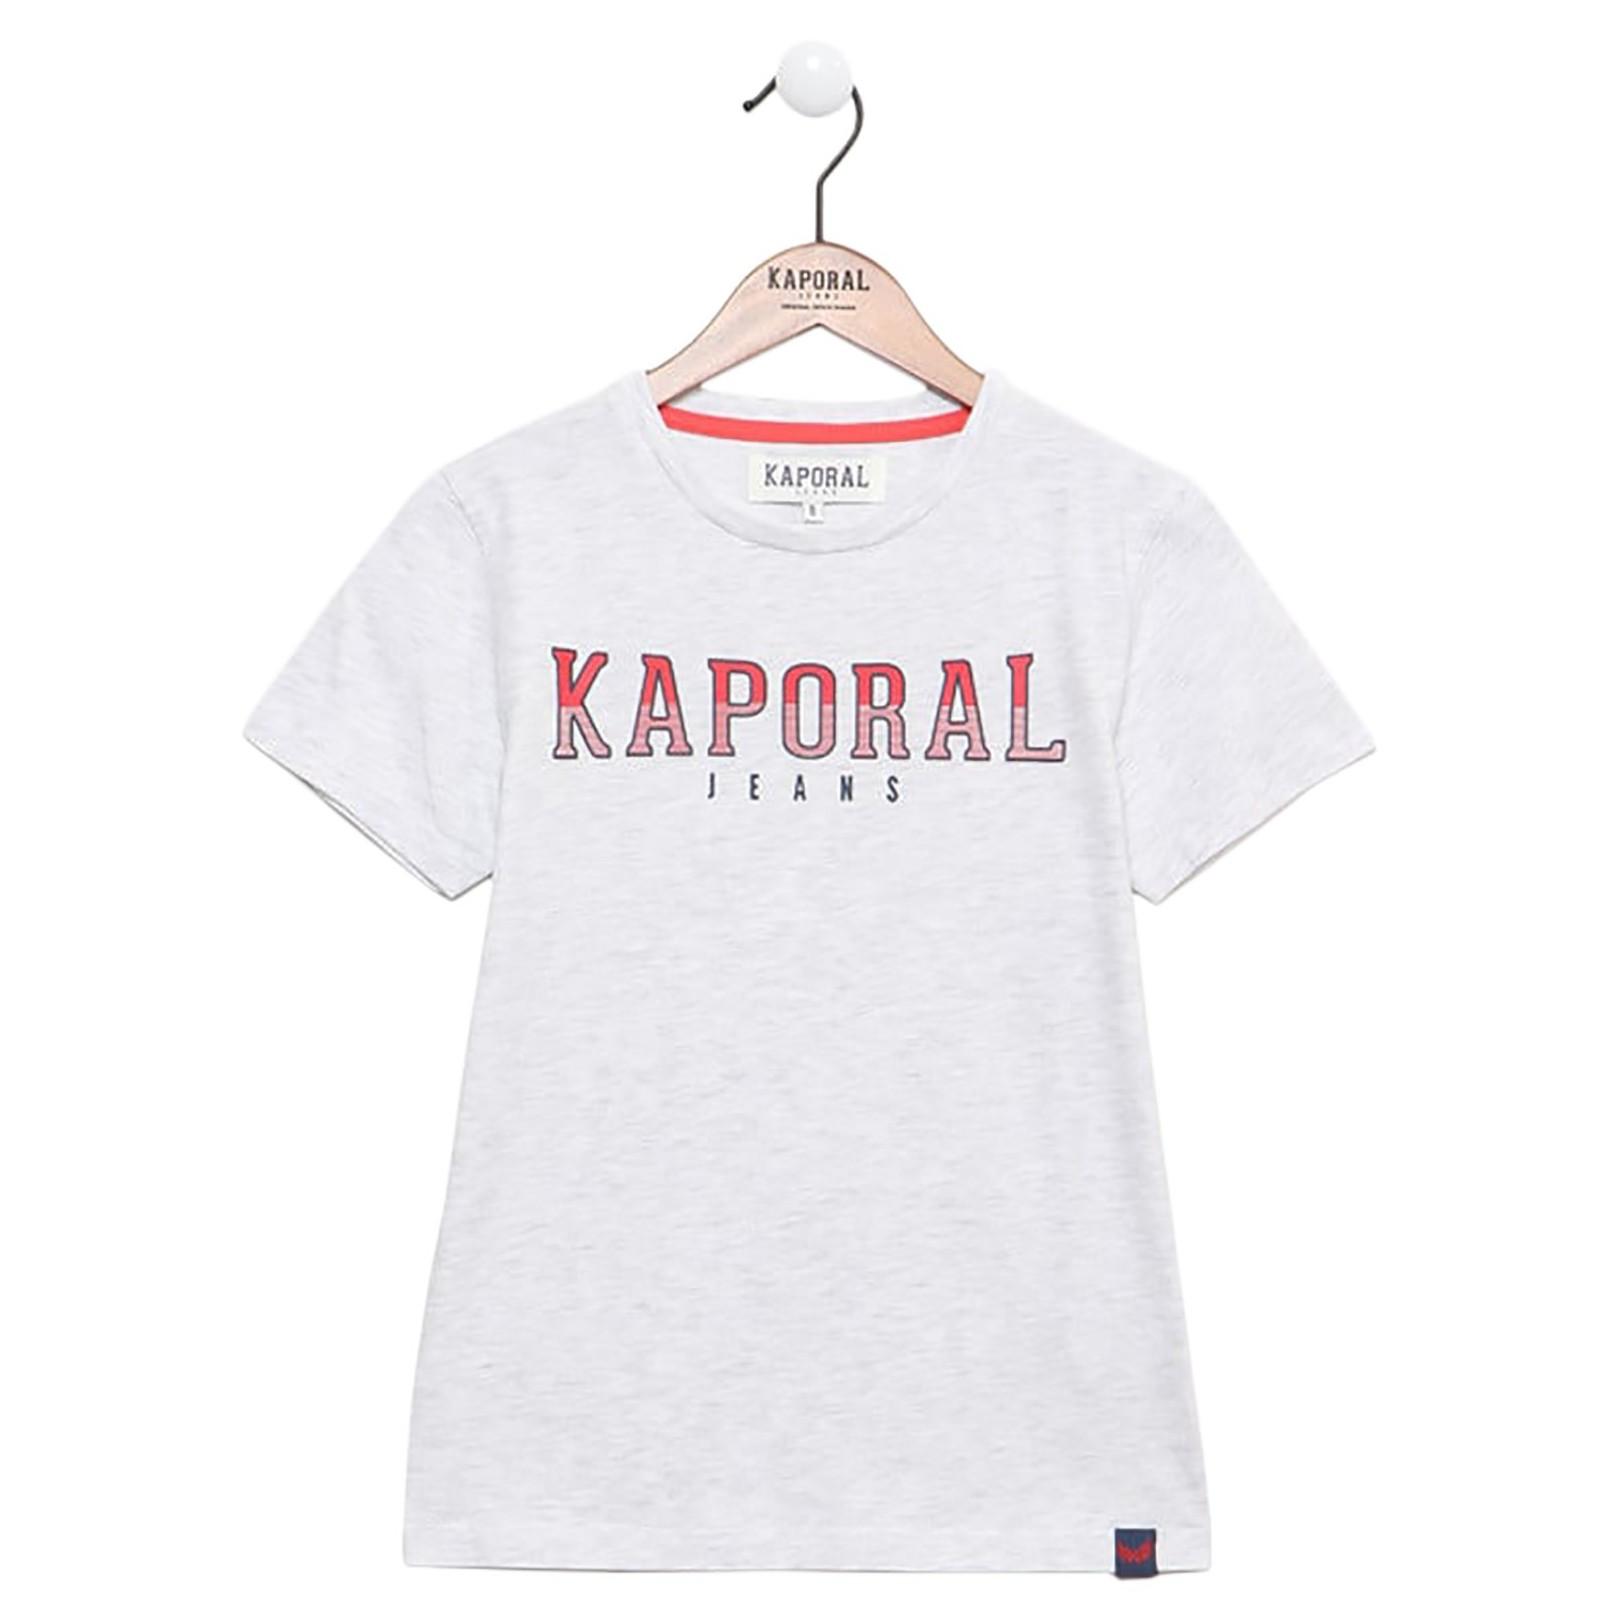 Tee Shirt Kaporal Enfant Enard